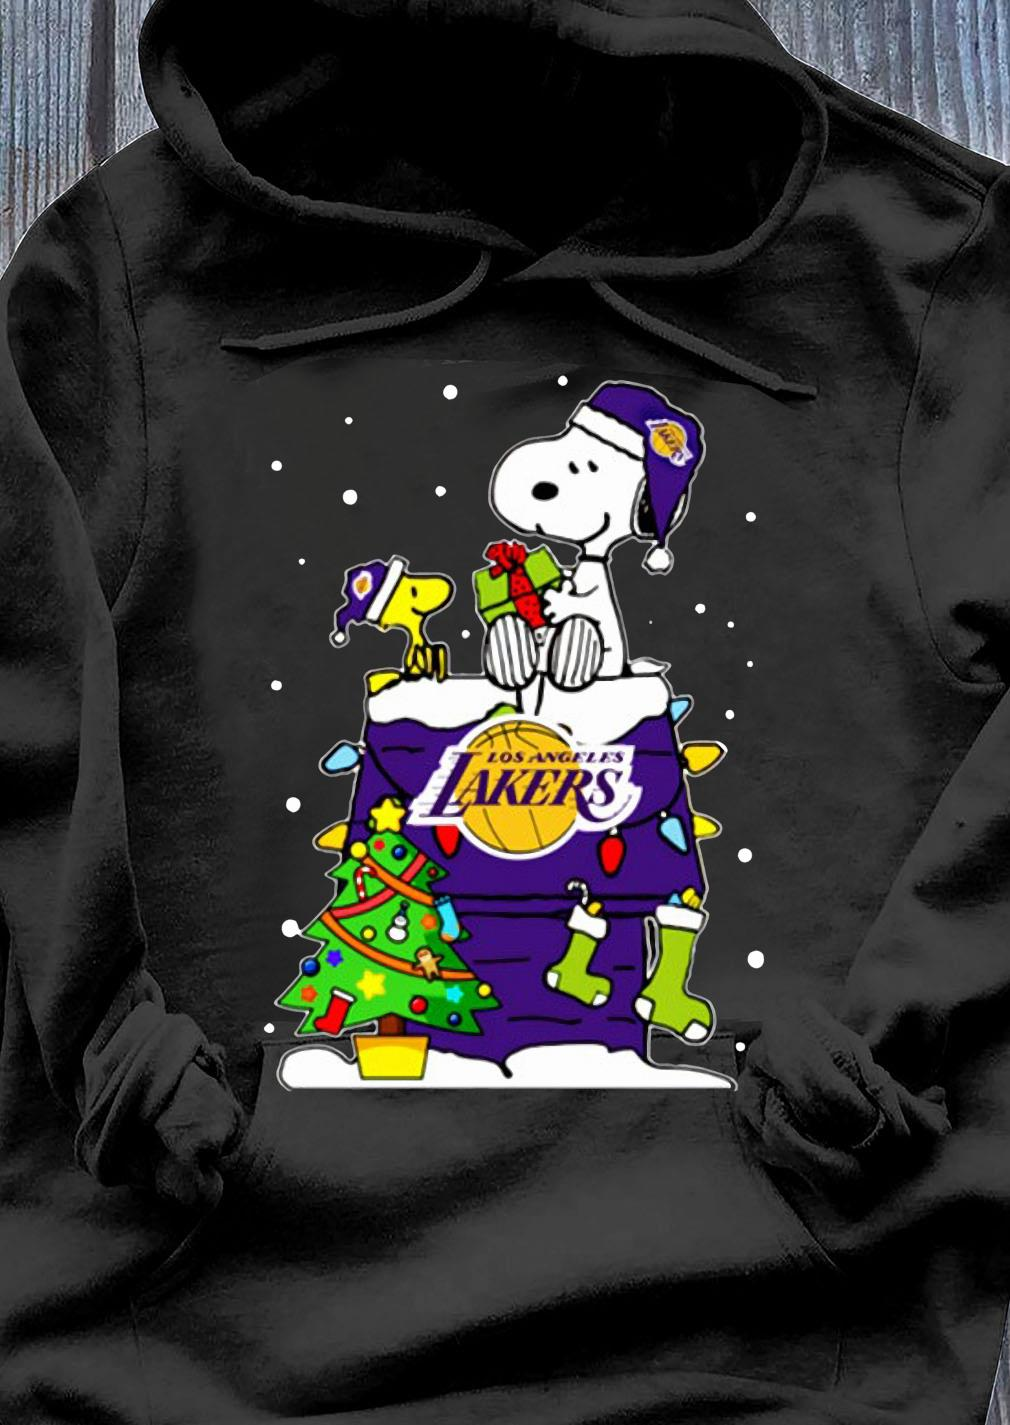 Snoopy Lakers Ugly Christmas Shirt Hoodie